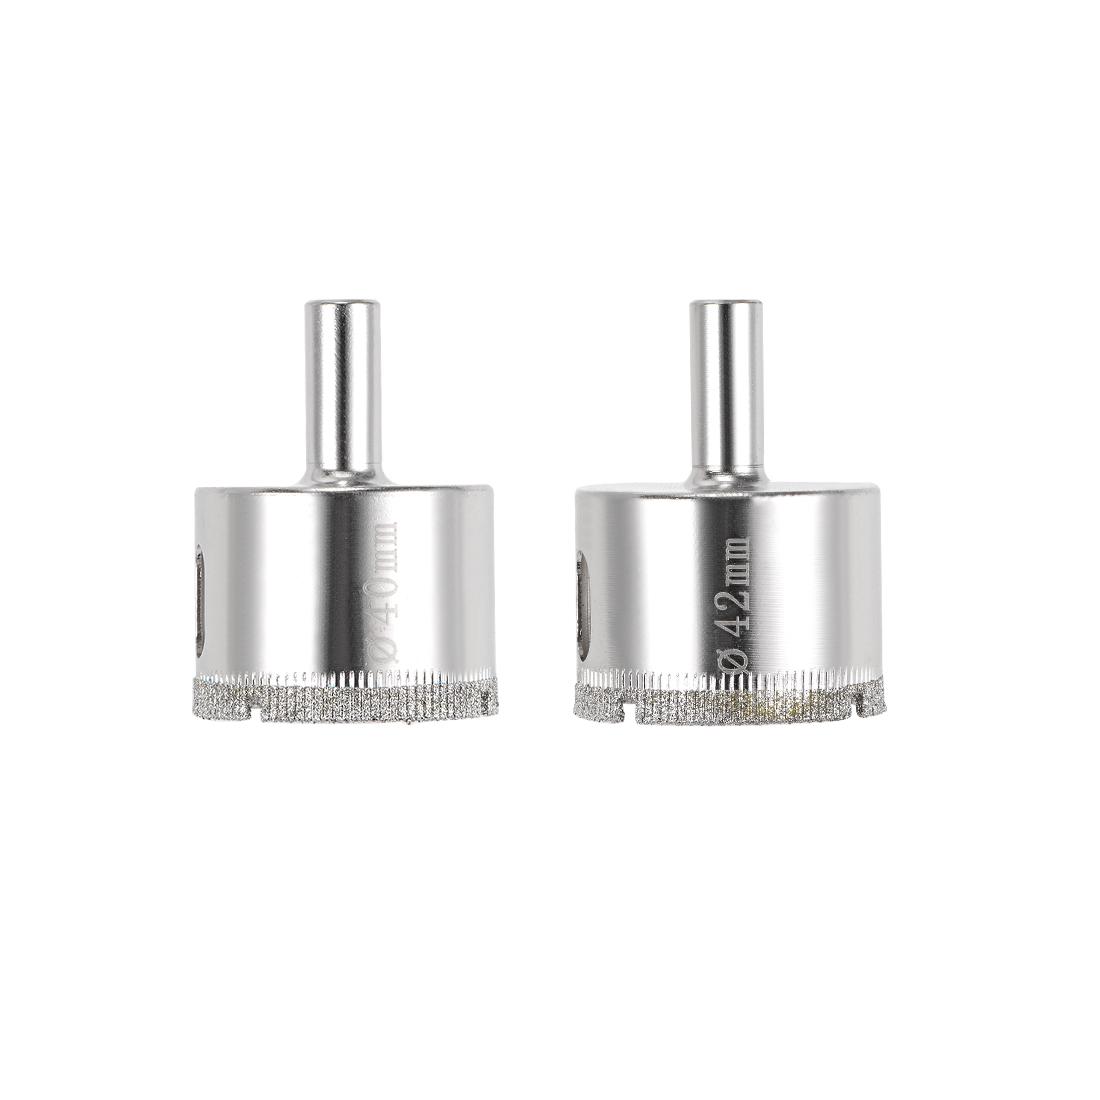 Diamond Drill Bits Set Glass Tile Core Drill Bits Hole Saws 2 Pcs (40mm, 42mm)